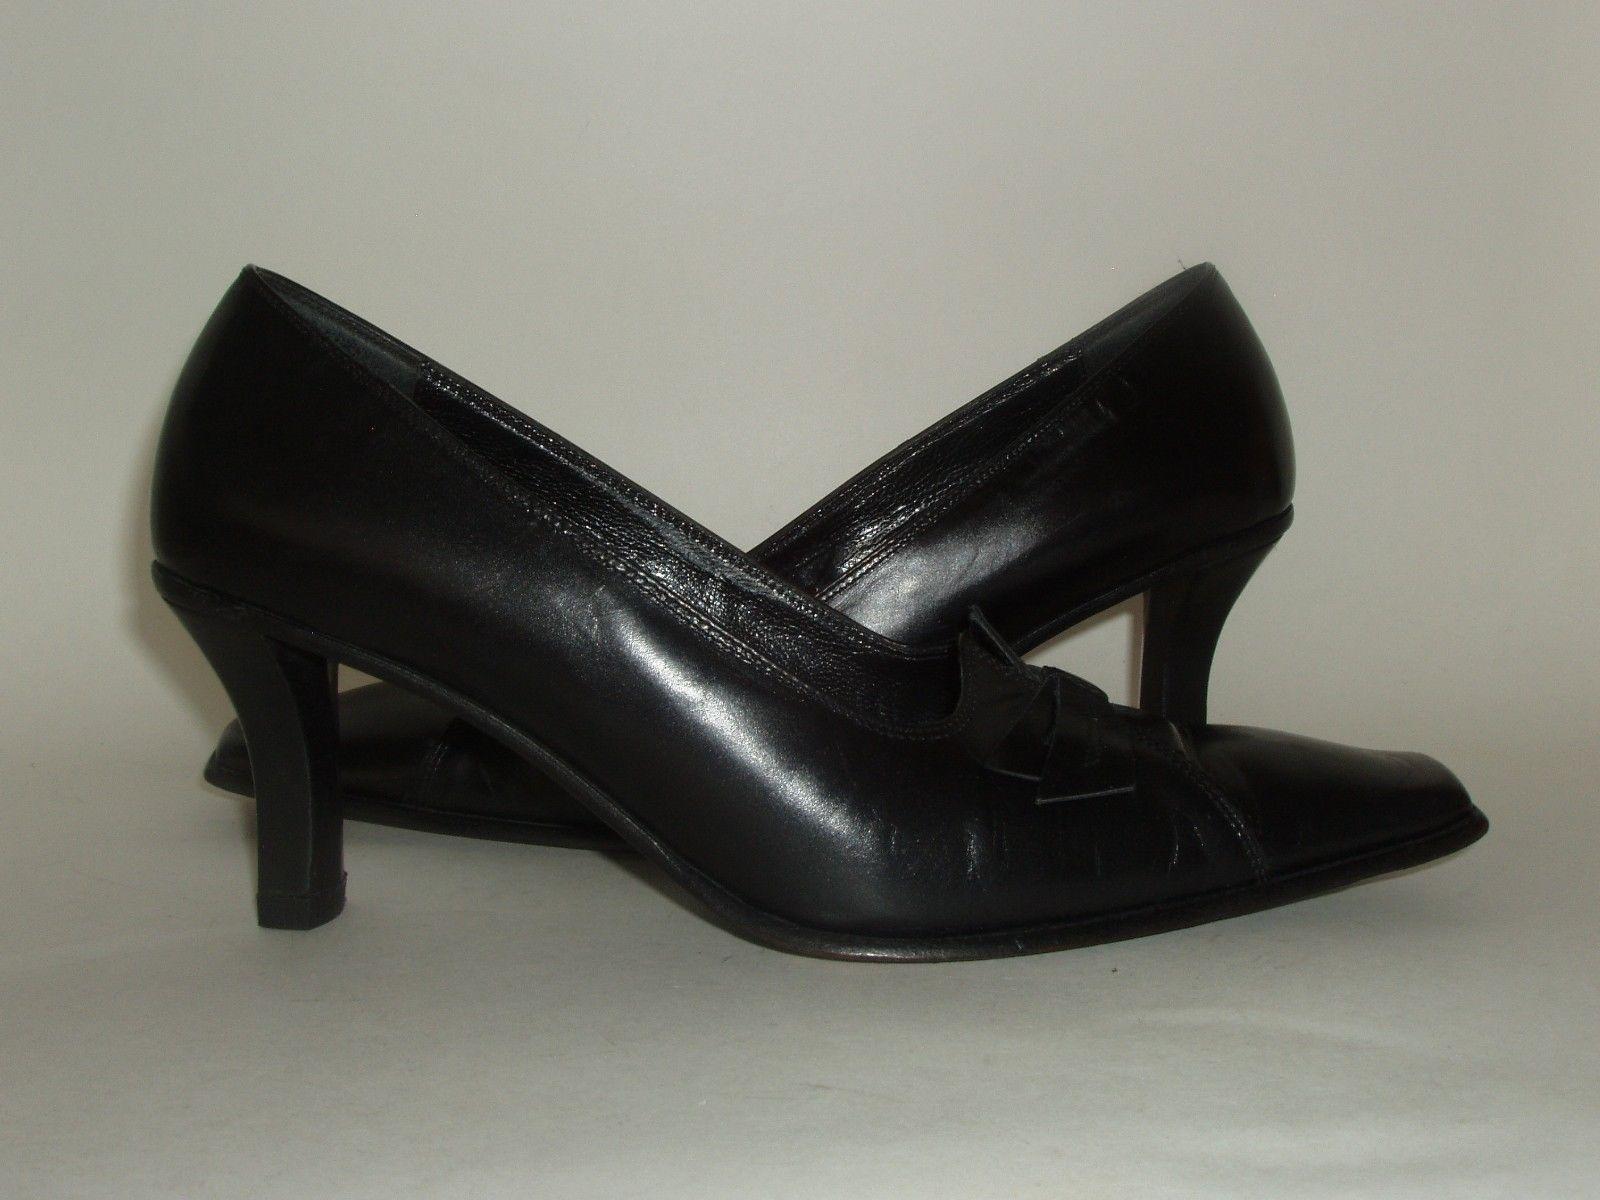 Roberto Botticelli Italian Made Black Leather High Heel Shoes Euro 37.5 US 7.5 image 3